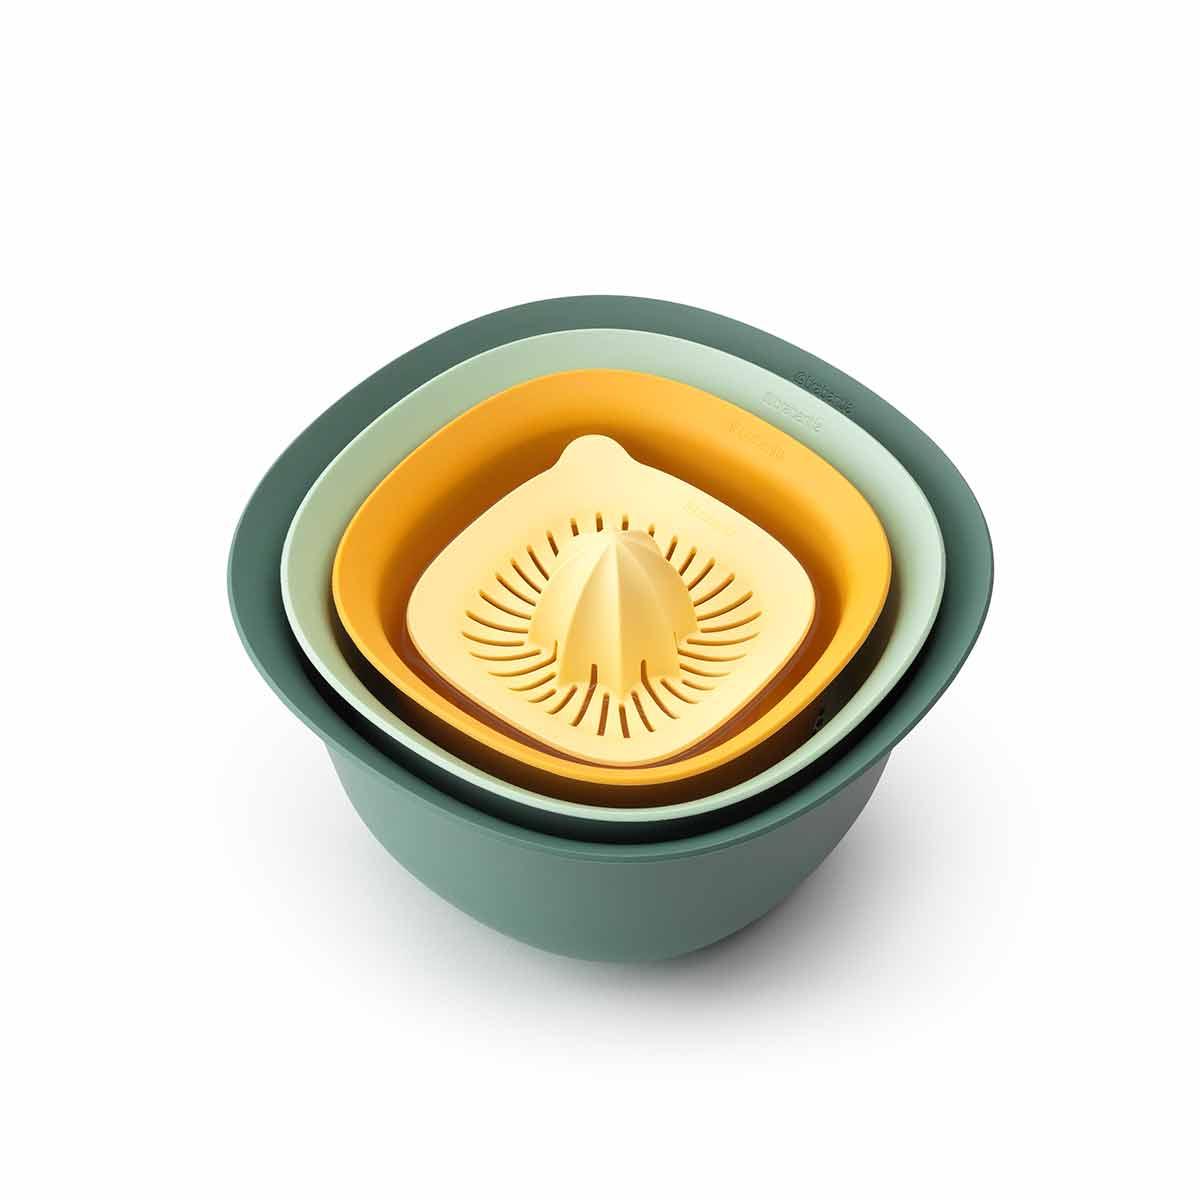 Brabantia Tasty Mixing Bowl Set, Assorted